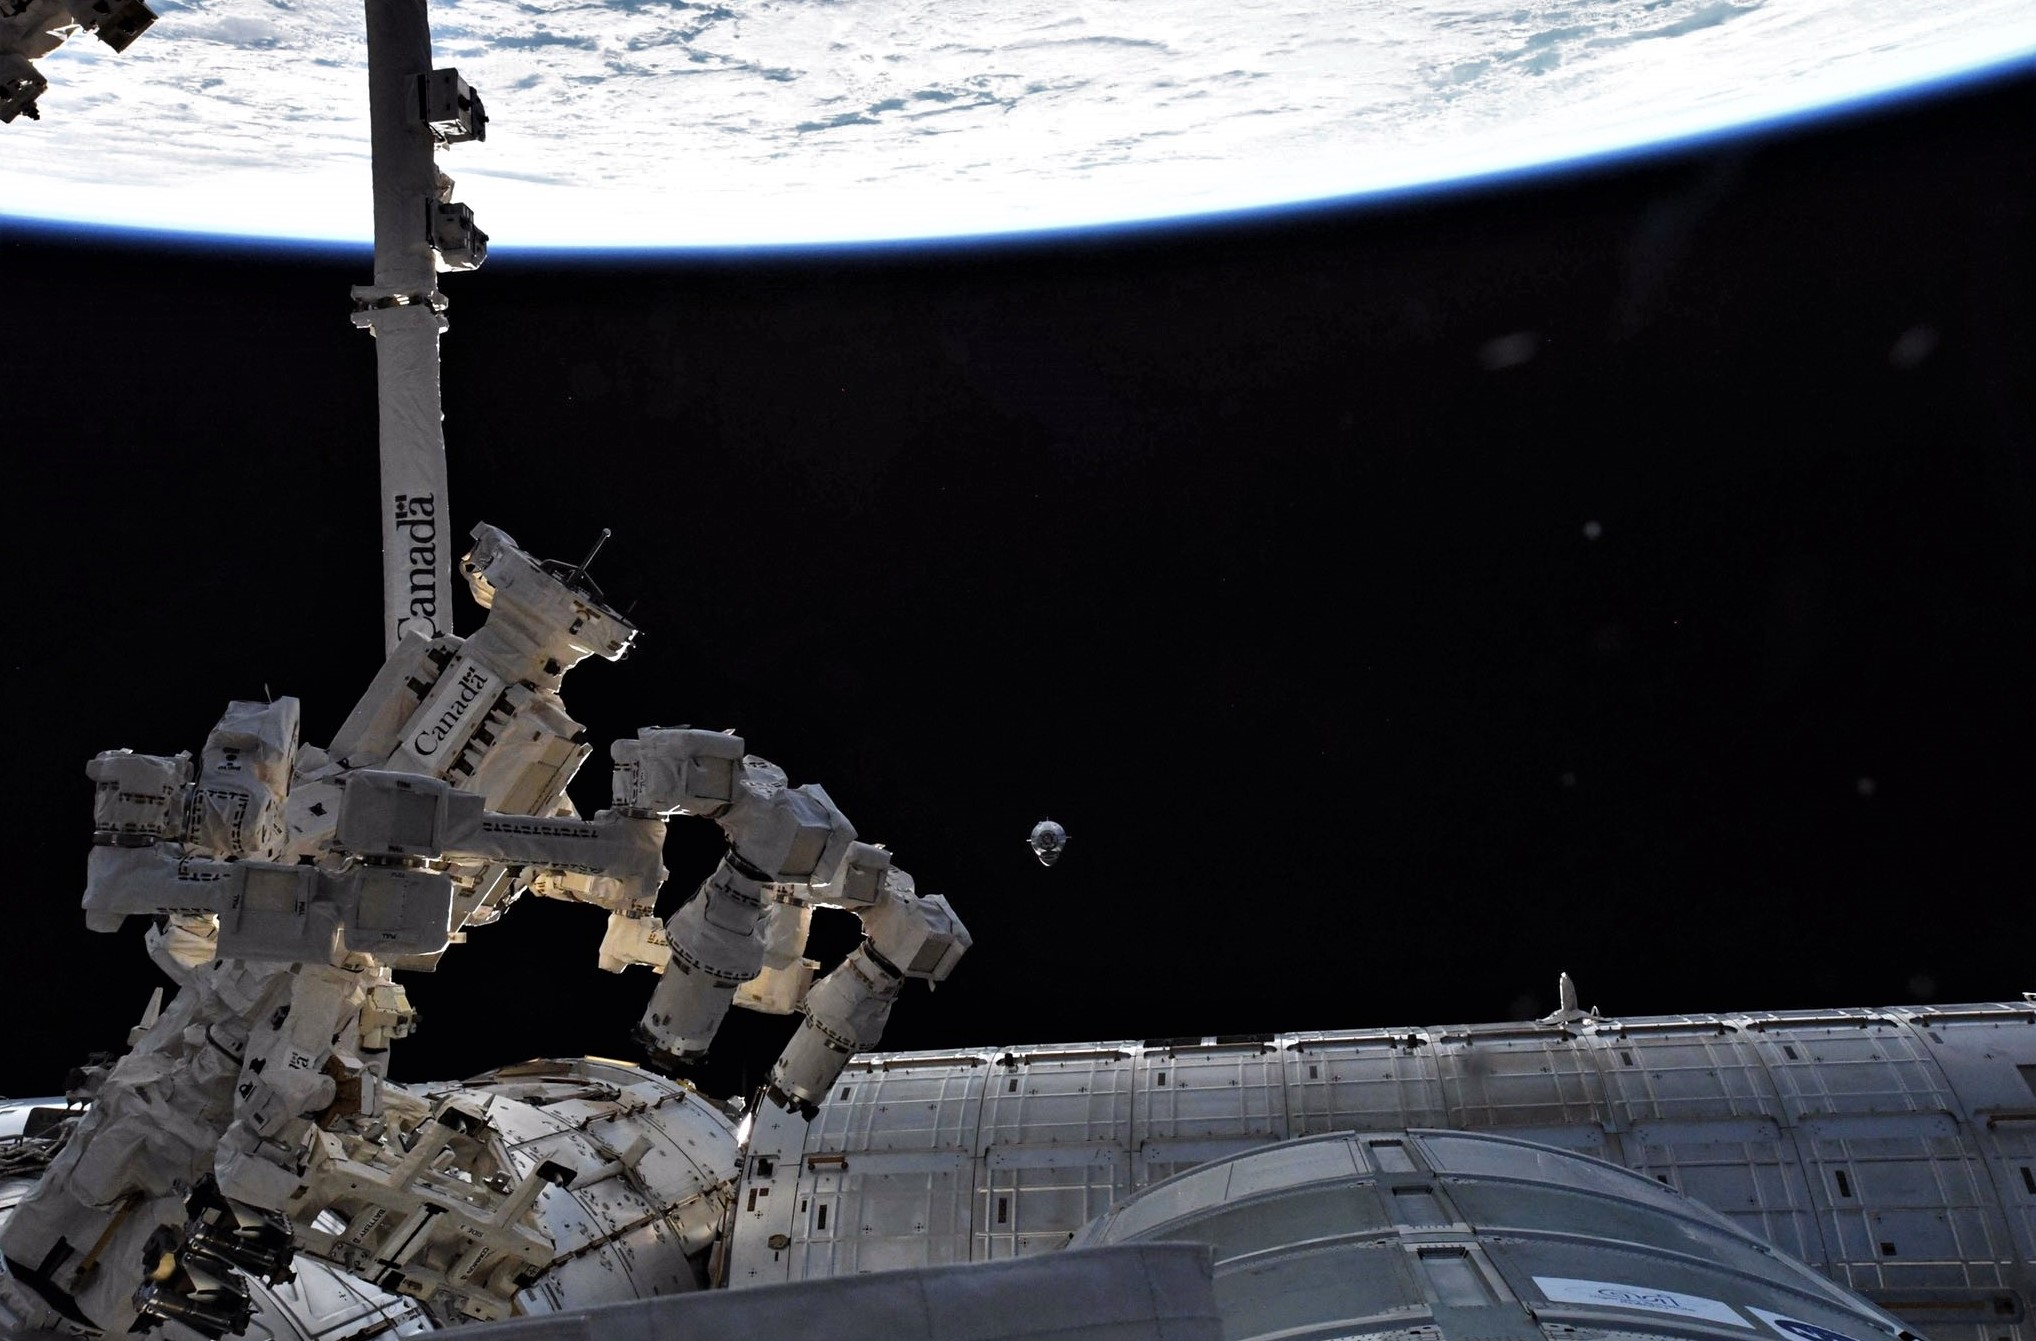 Crew Dragon DM-1 ISS arrival 030319 (David Saint-Jacques) 1